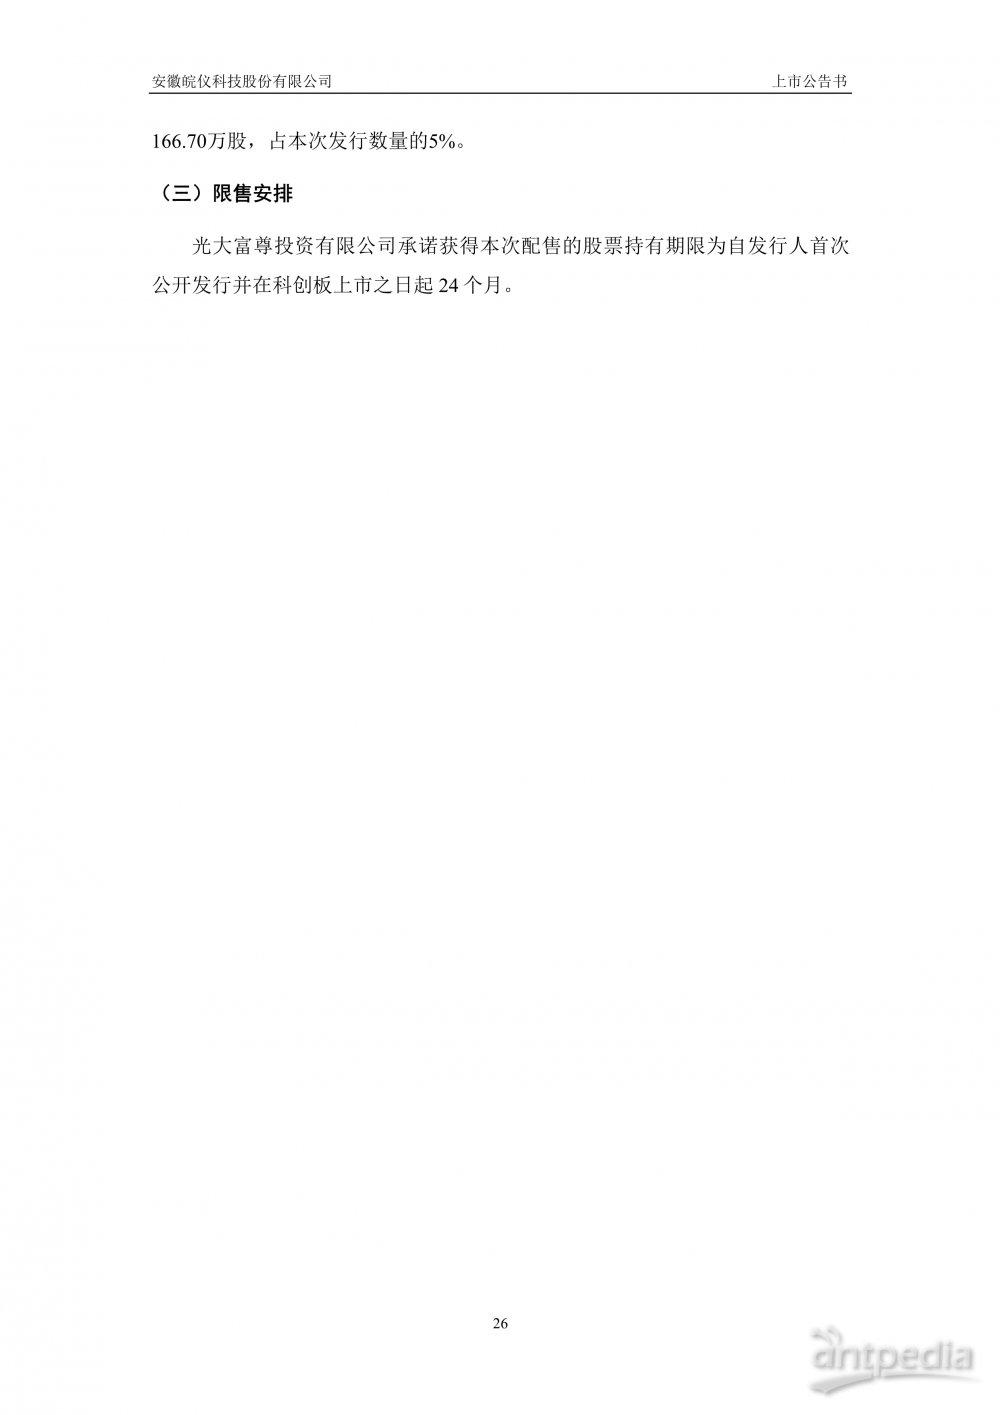 2e94f516-d1c6-456f-b845-449542b66b38_27.jpg